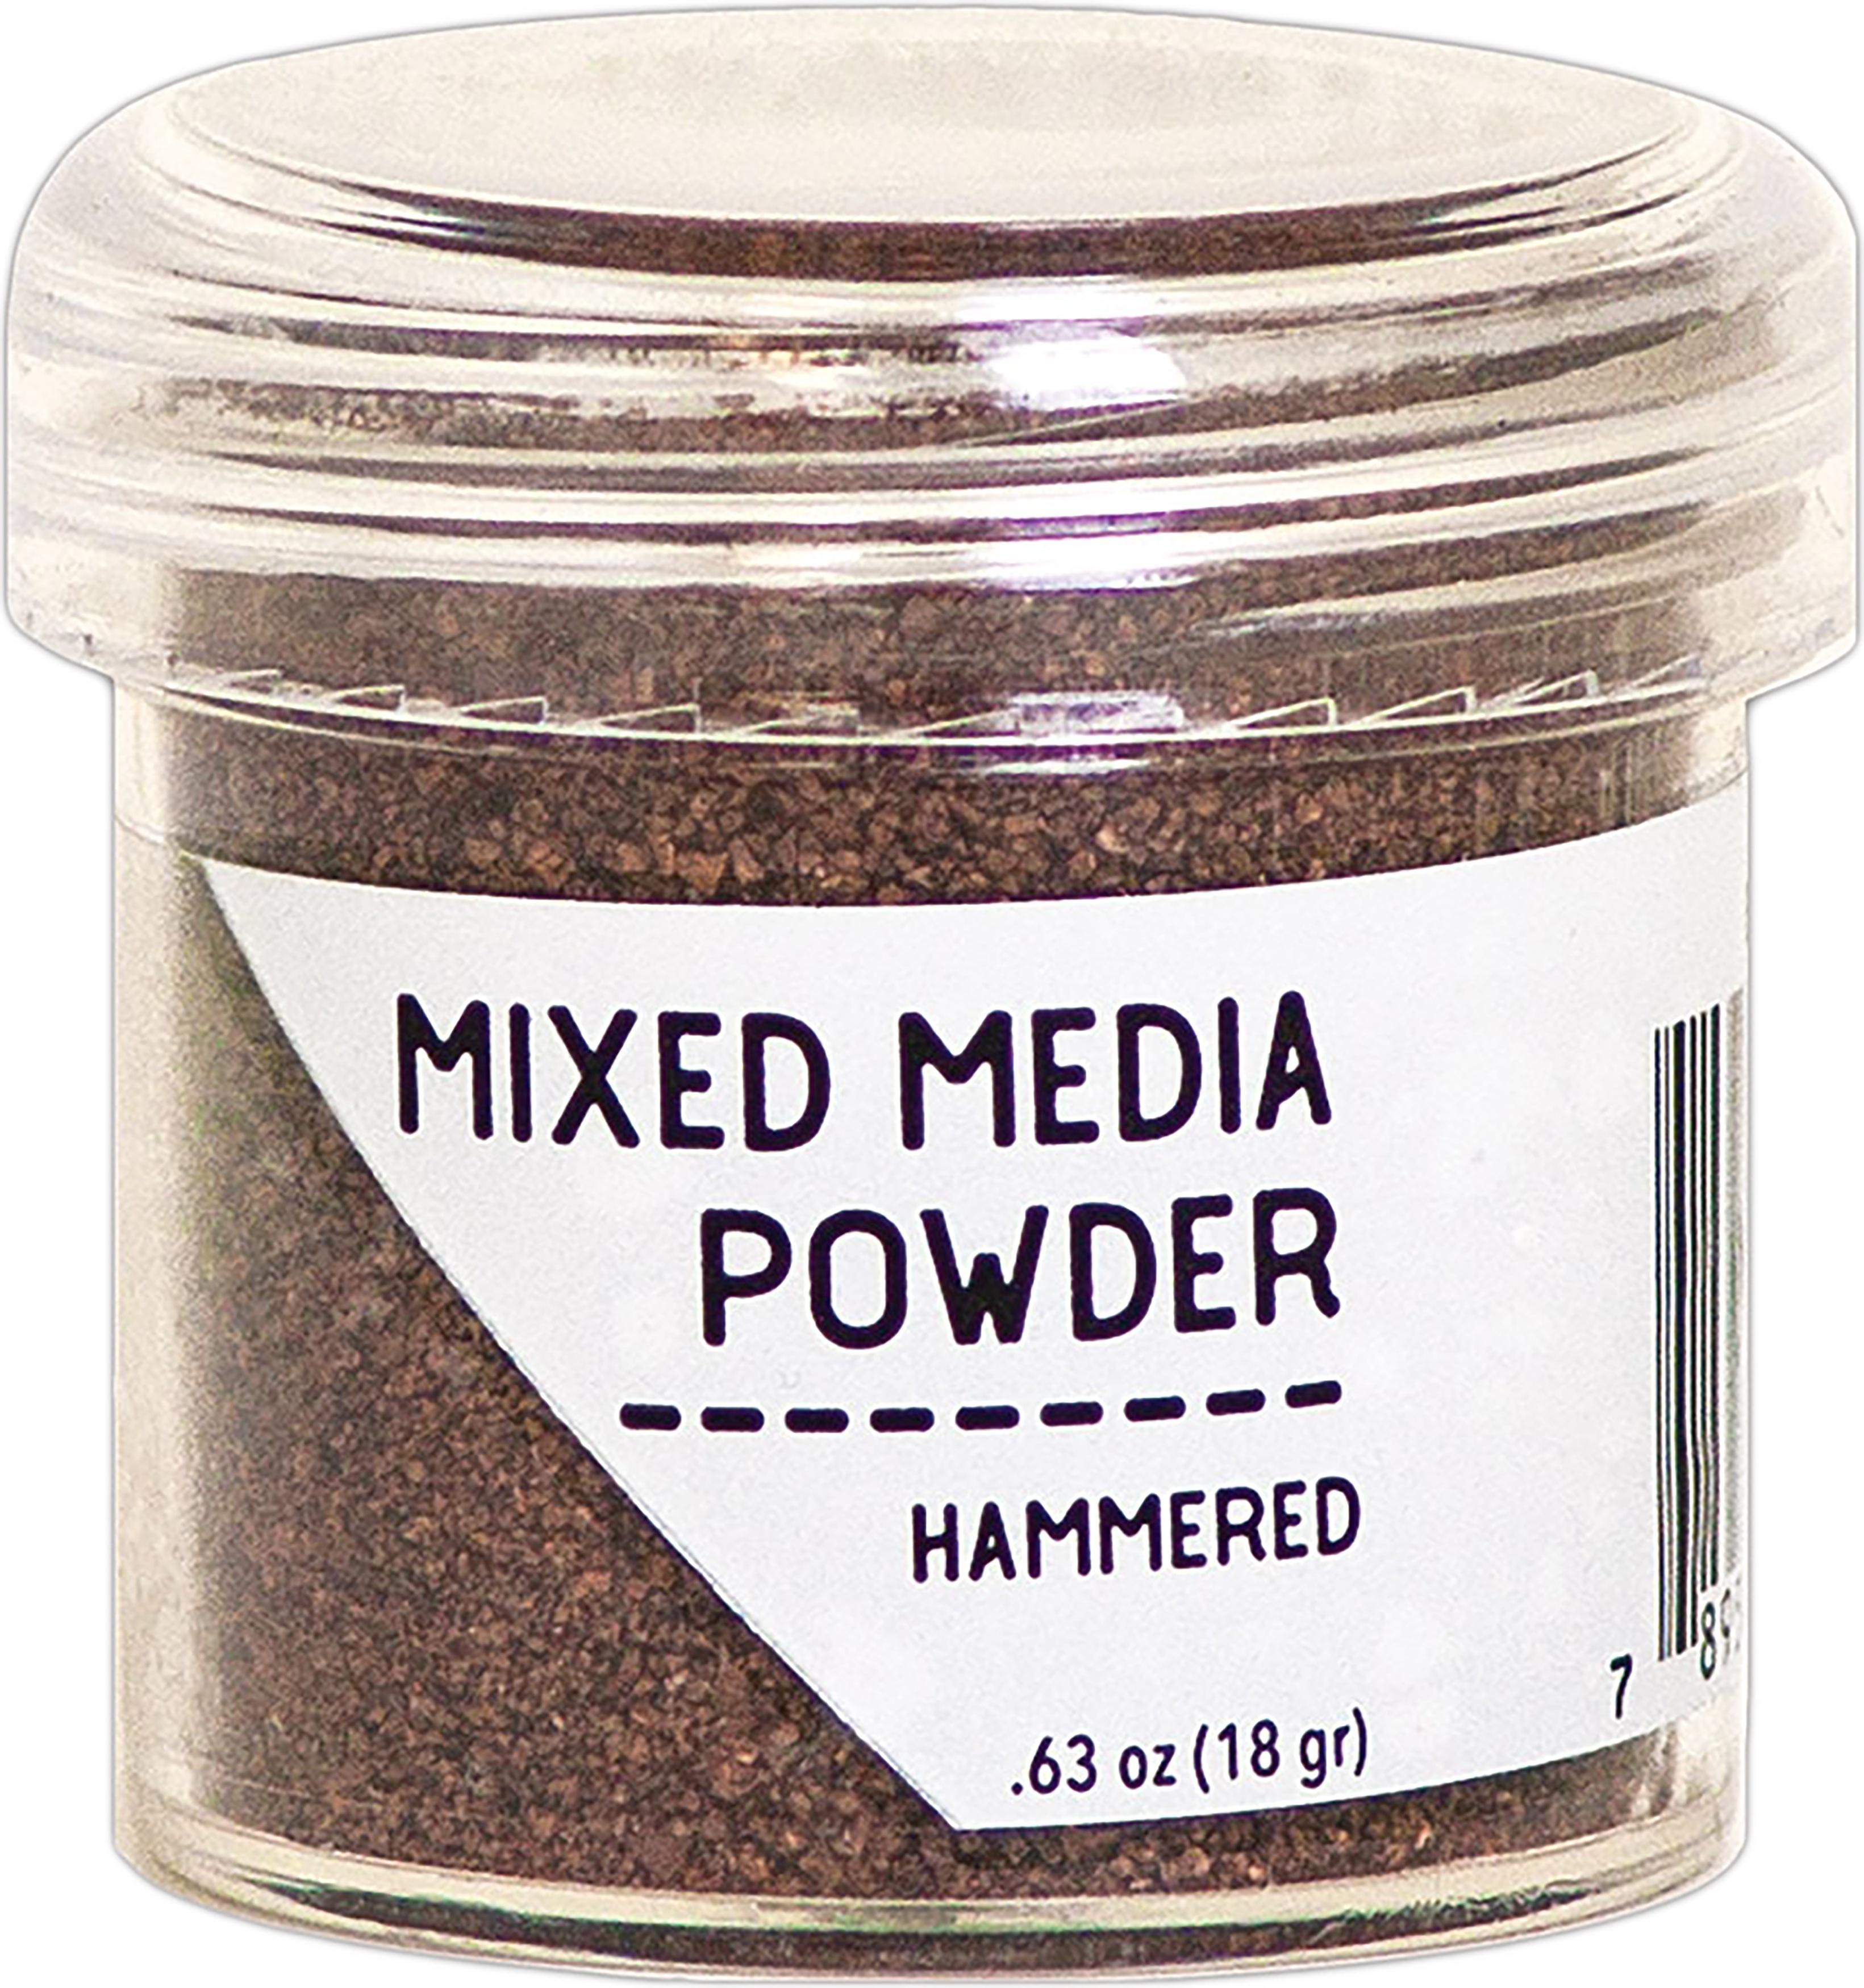 HAMMERED  -MIXED MEDIA POWDER